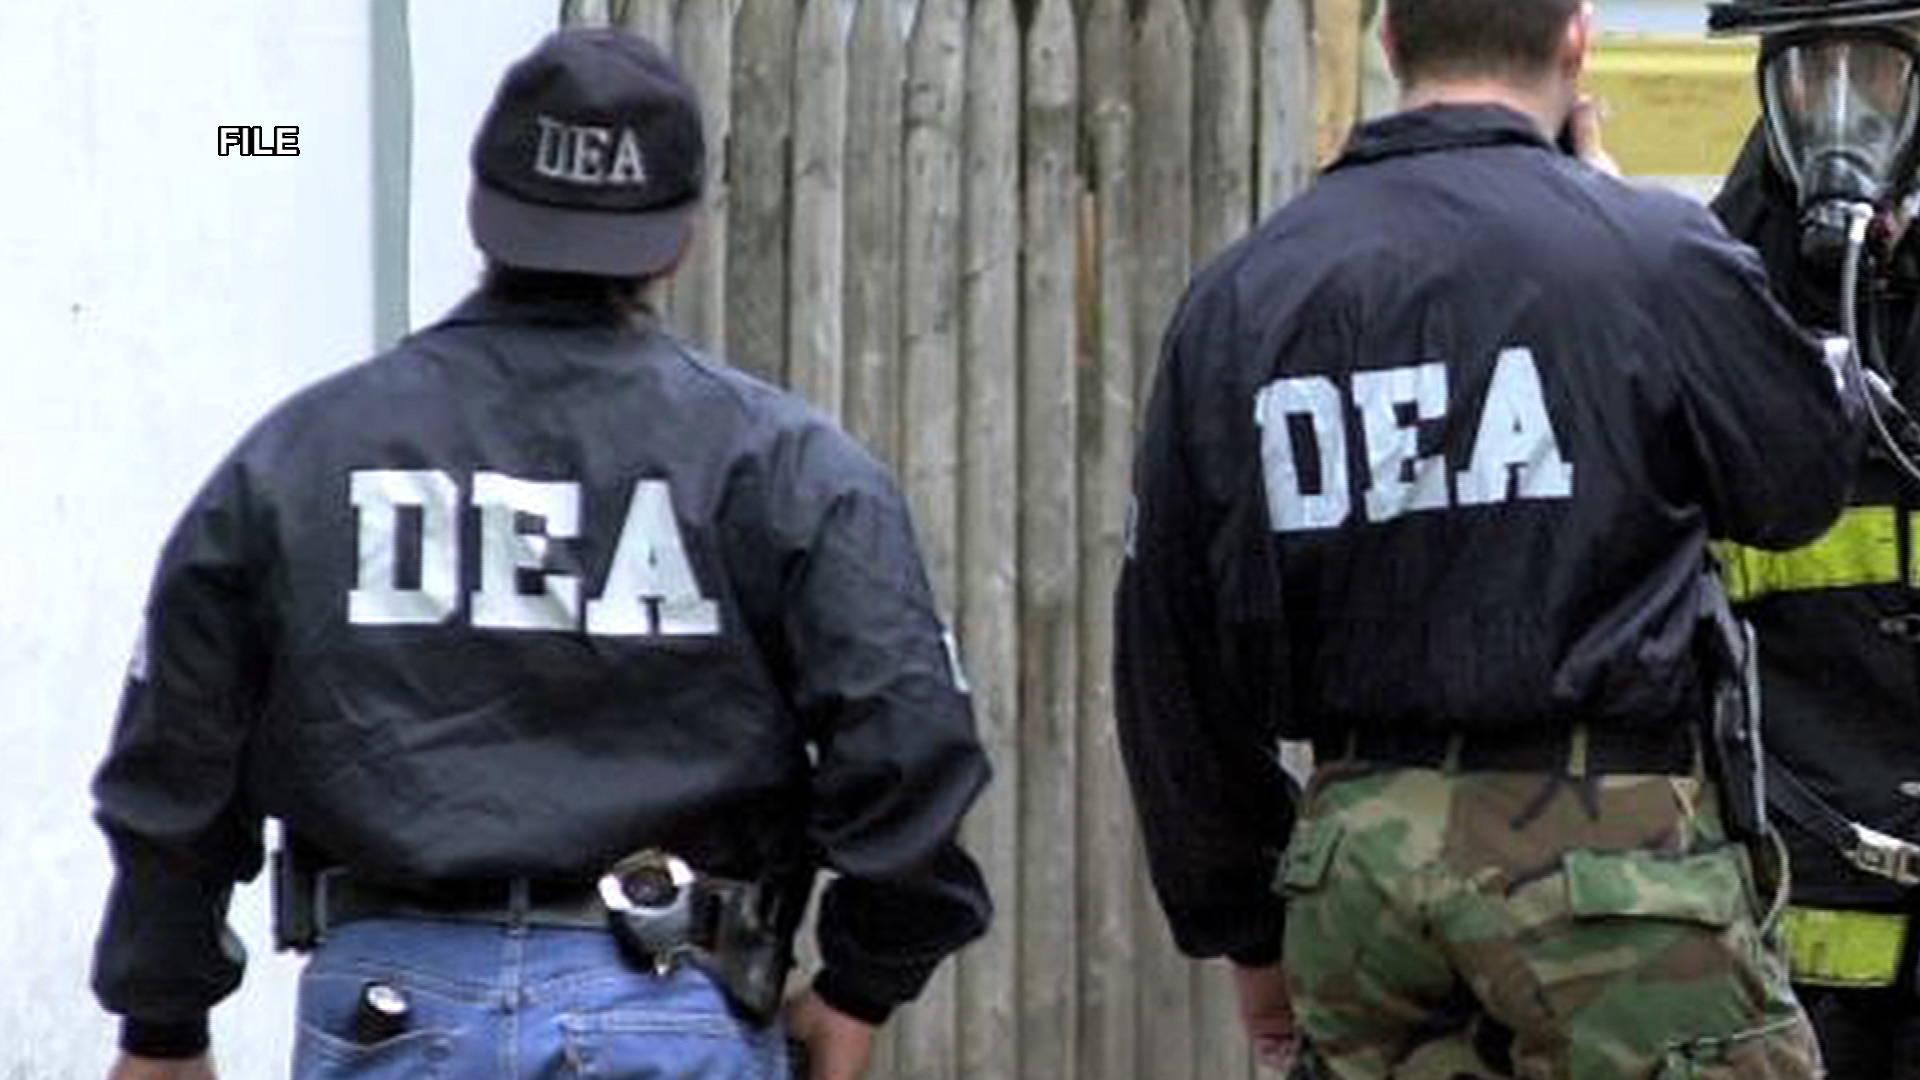 Meet 60 Minutes' DEA whistleblower - CBS News